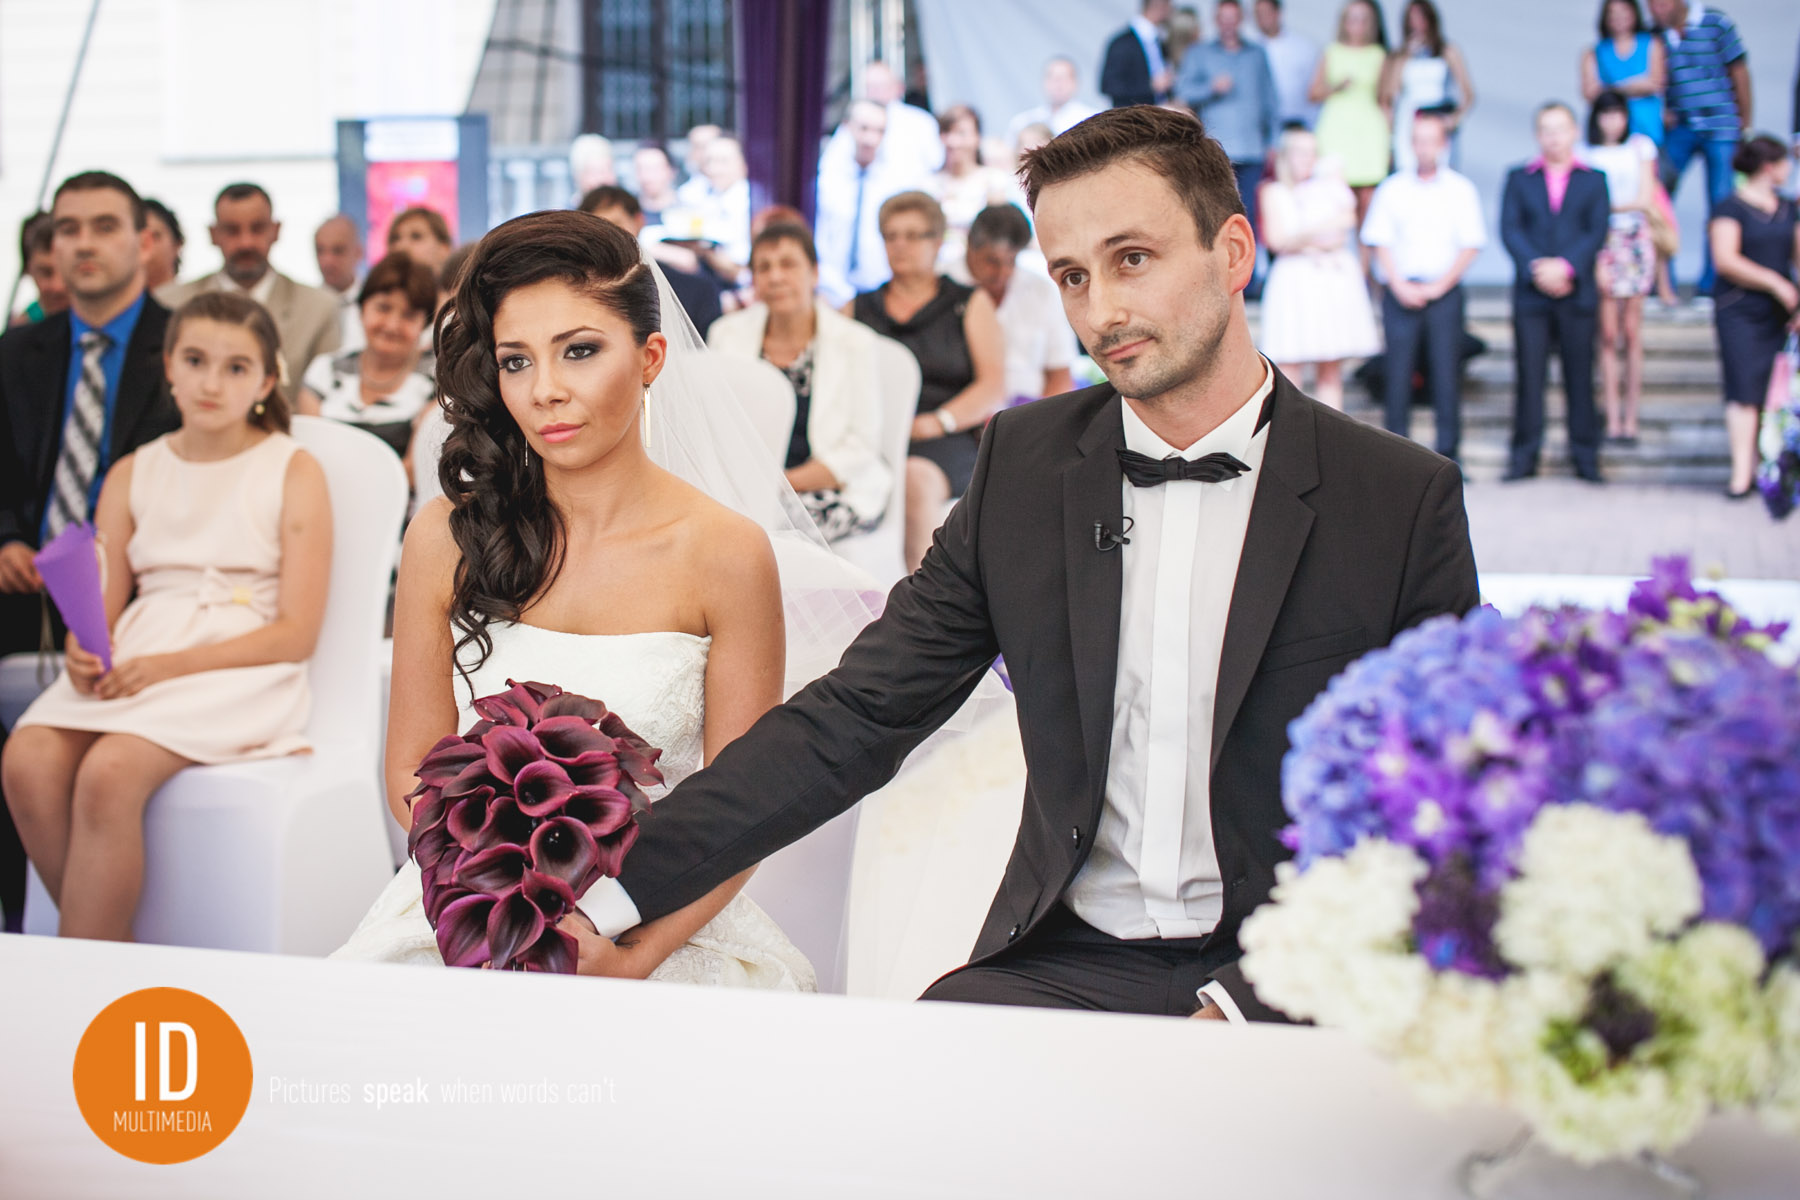 Ślub Karoliny i Jacka